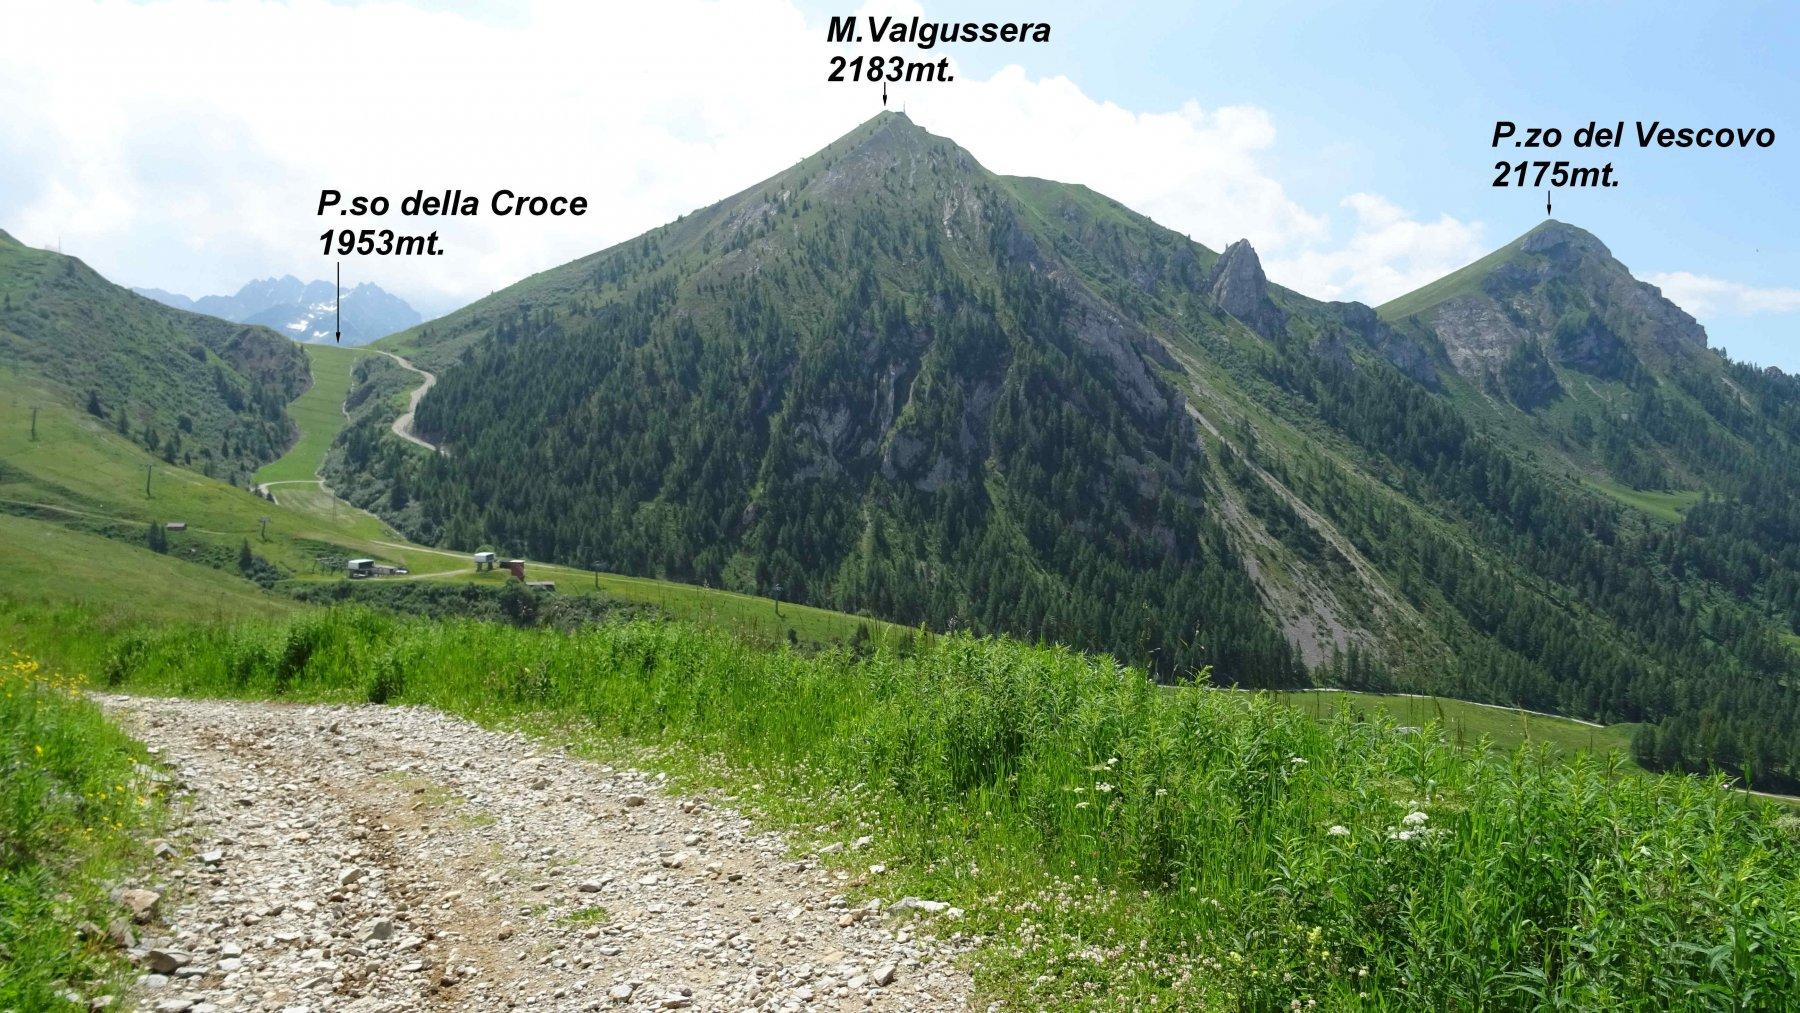 Dordona, Valbona, Toro (Passi)da Foppolo, giro del Monte Toro 2020-06-28